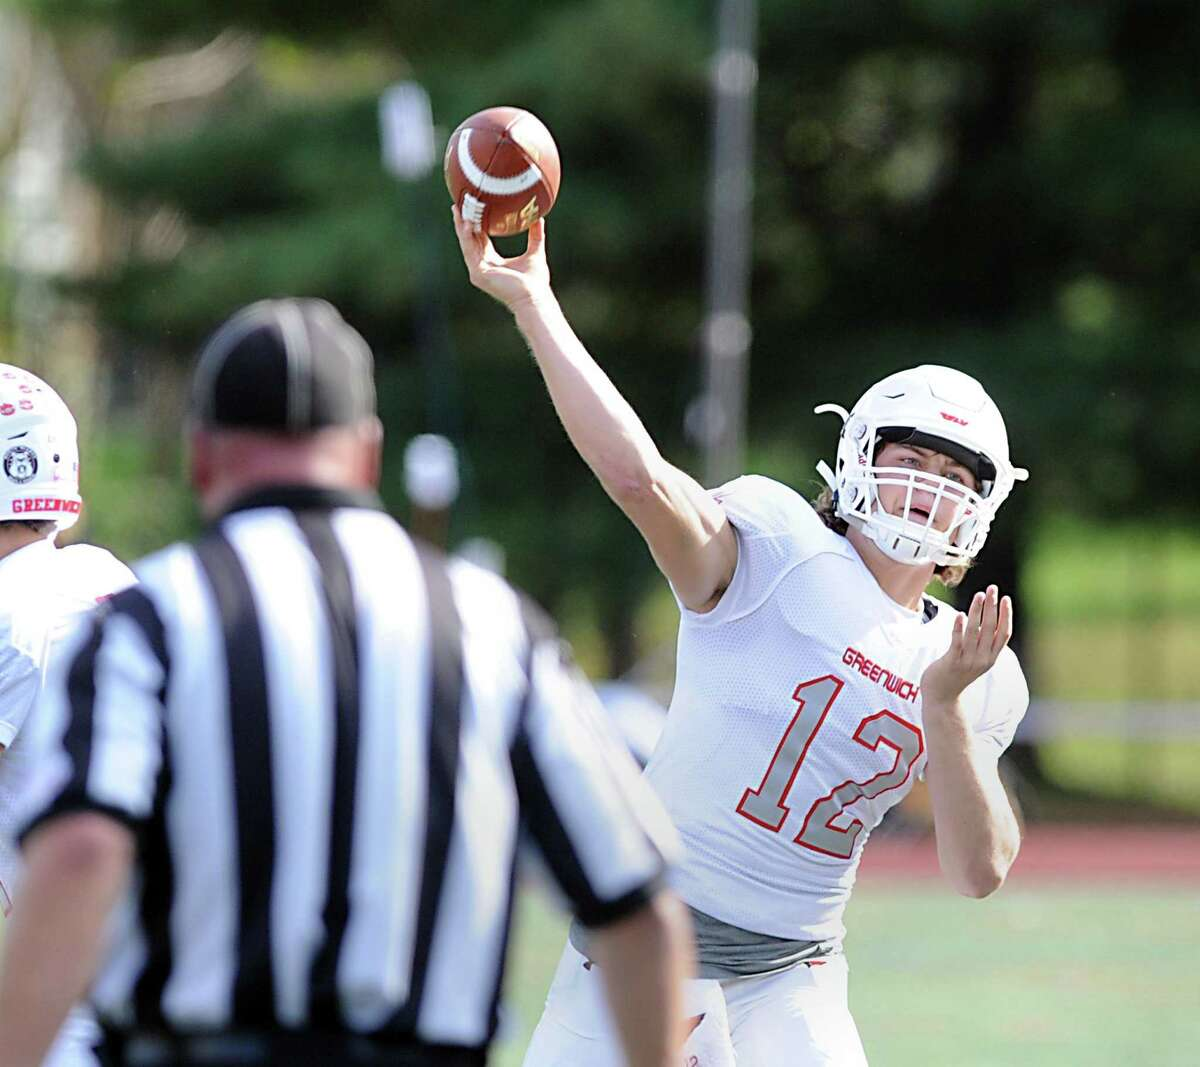 Greenwich quarterback Gavin Muir throws against Westhill on Oct. 20.